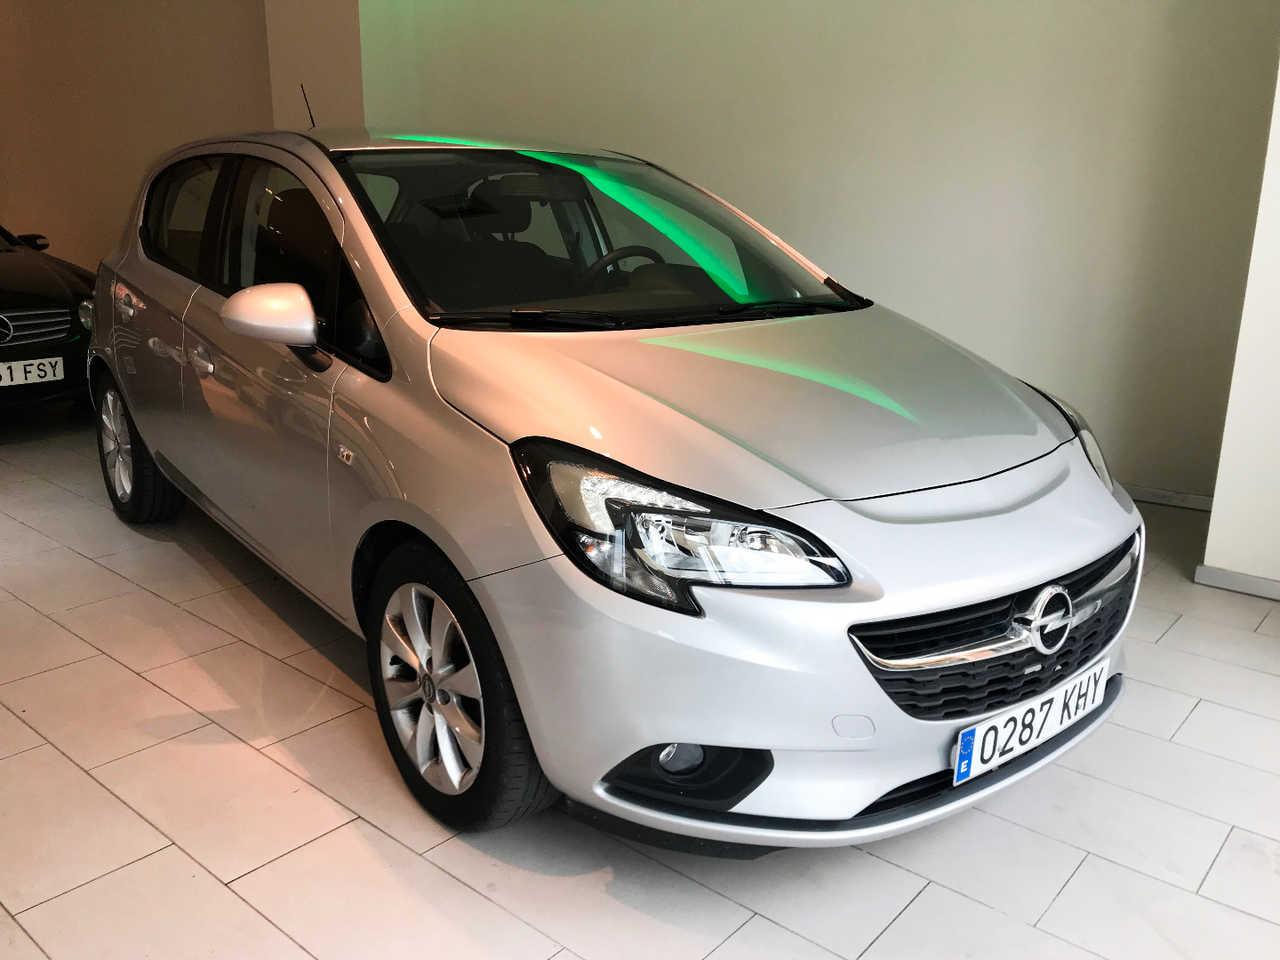 Opel Corsa 1.4 Selective Gasolina   - Foto 1